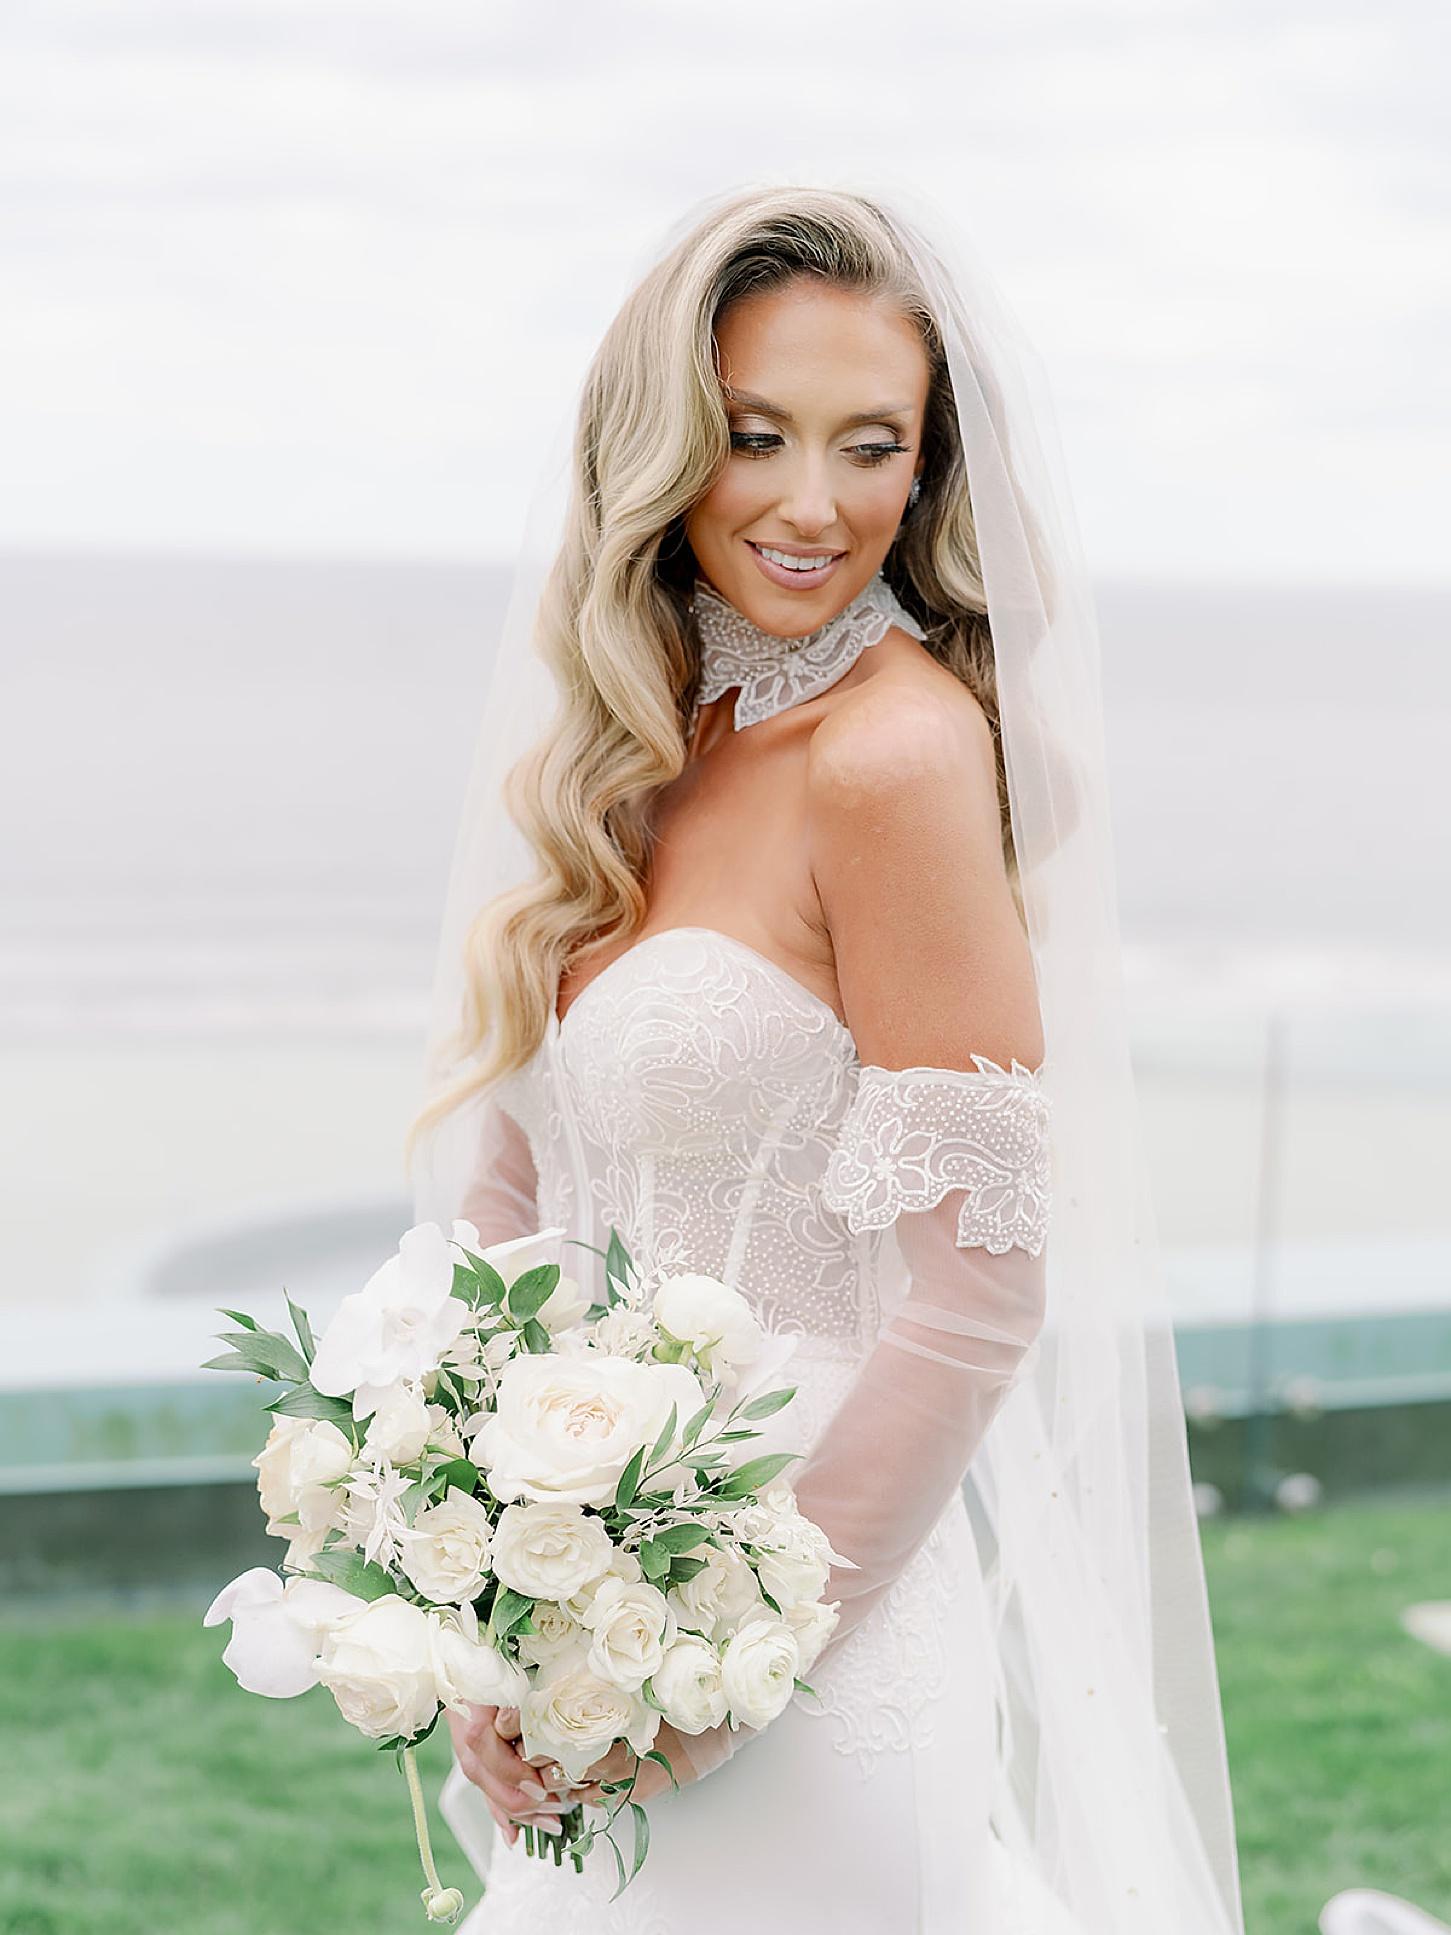 Atlantic City Wedding Photography Studio by Magdalena Studios Lexy Cha 0065